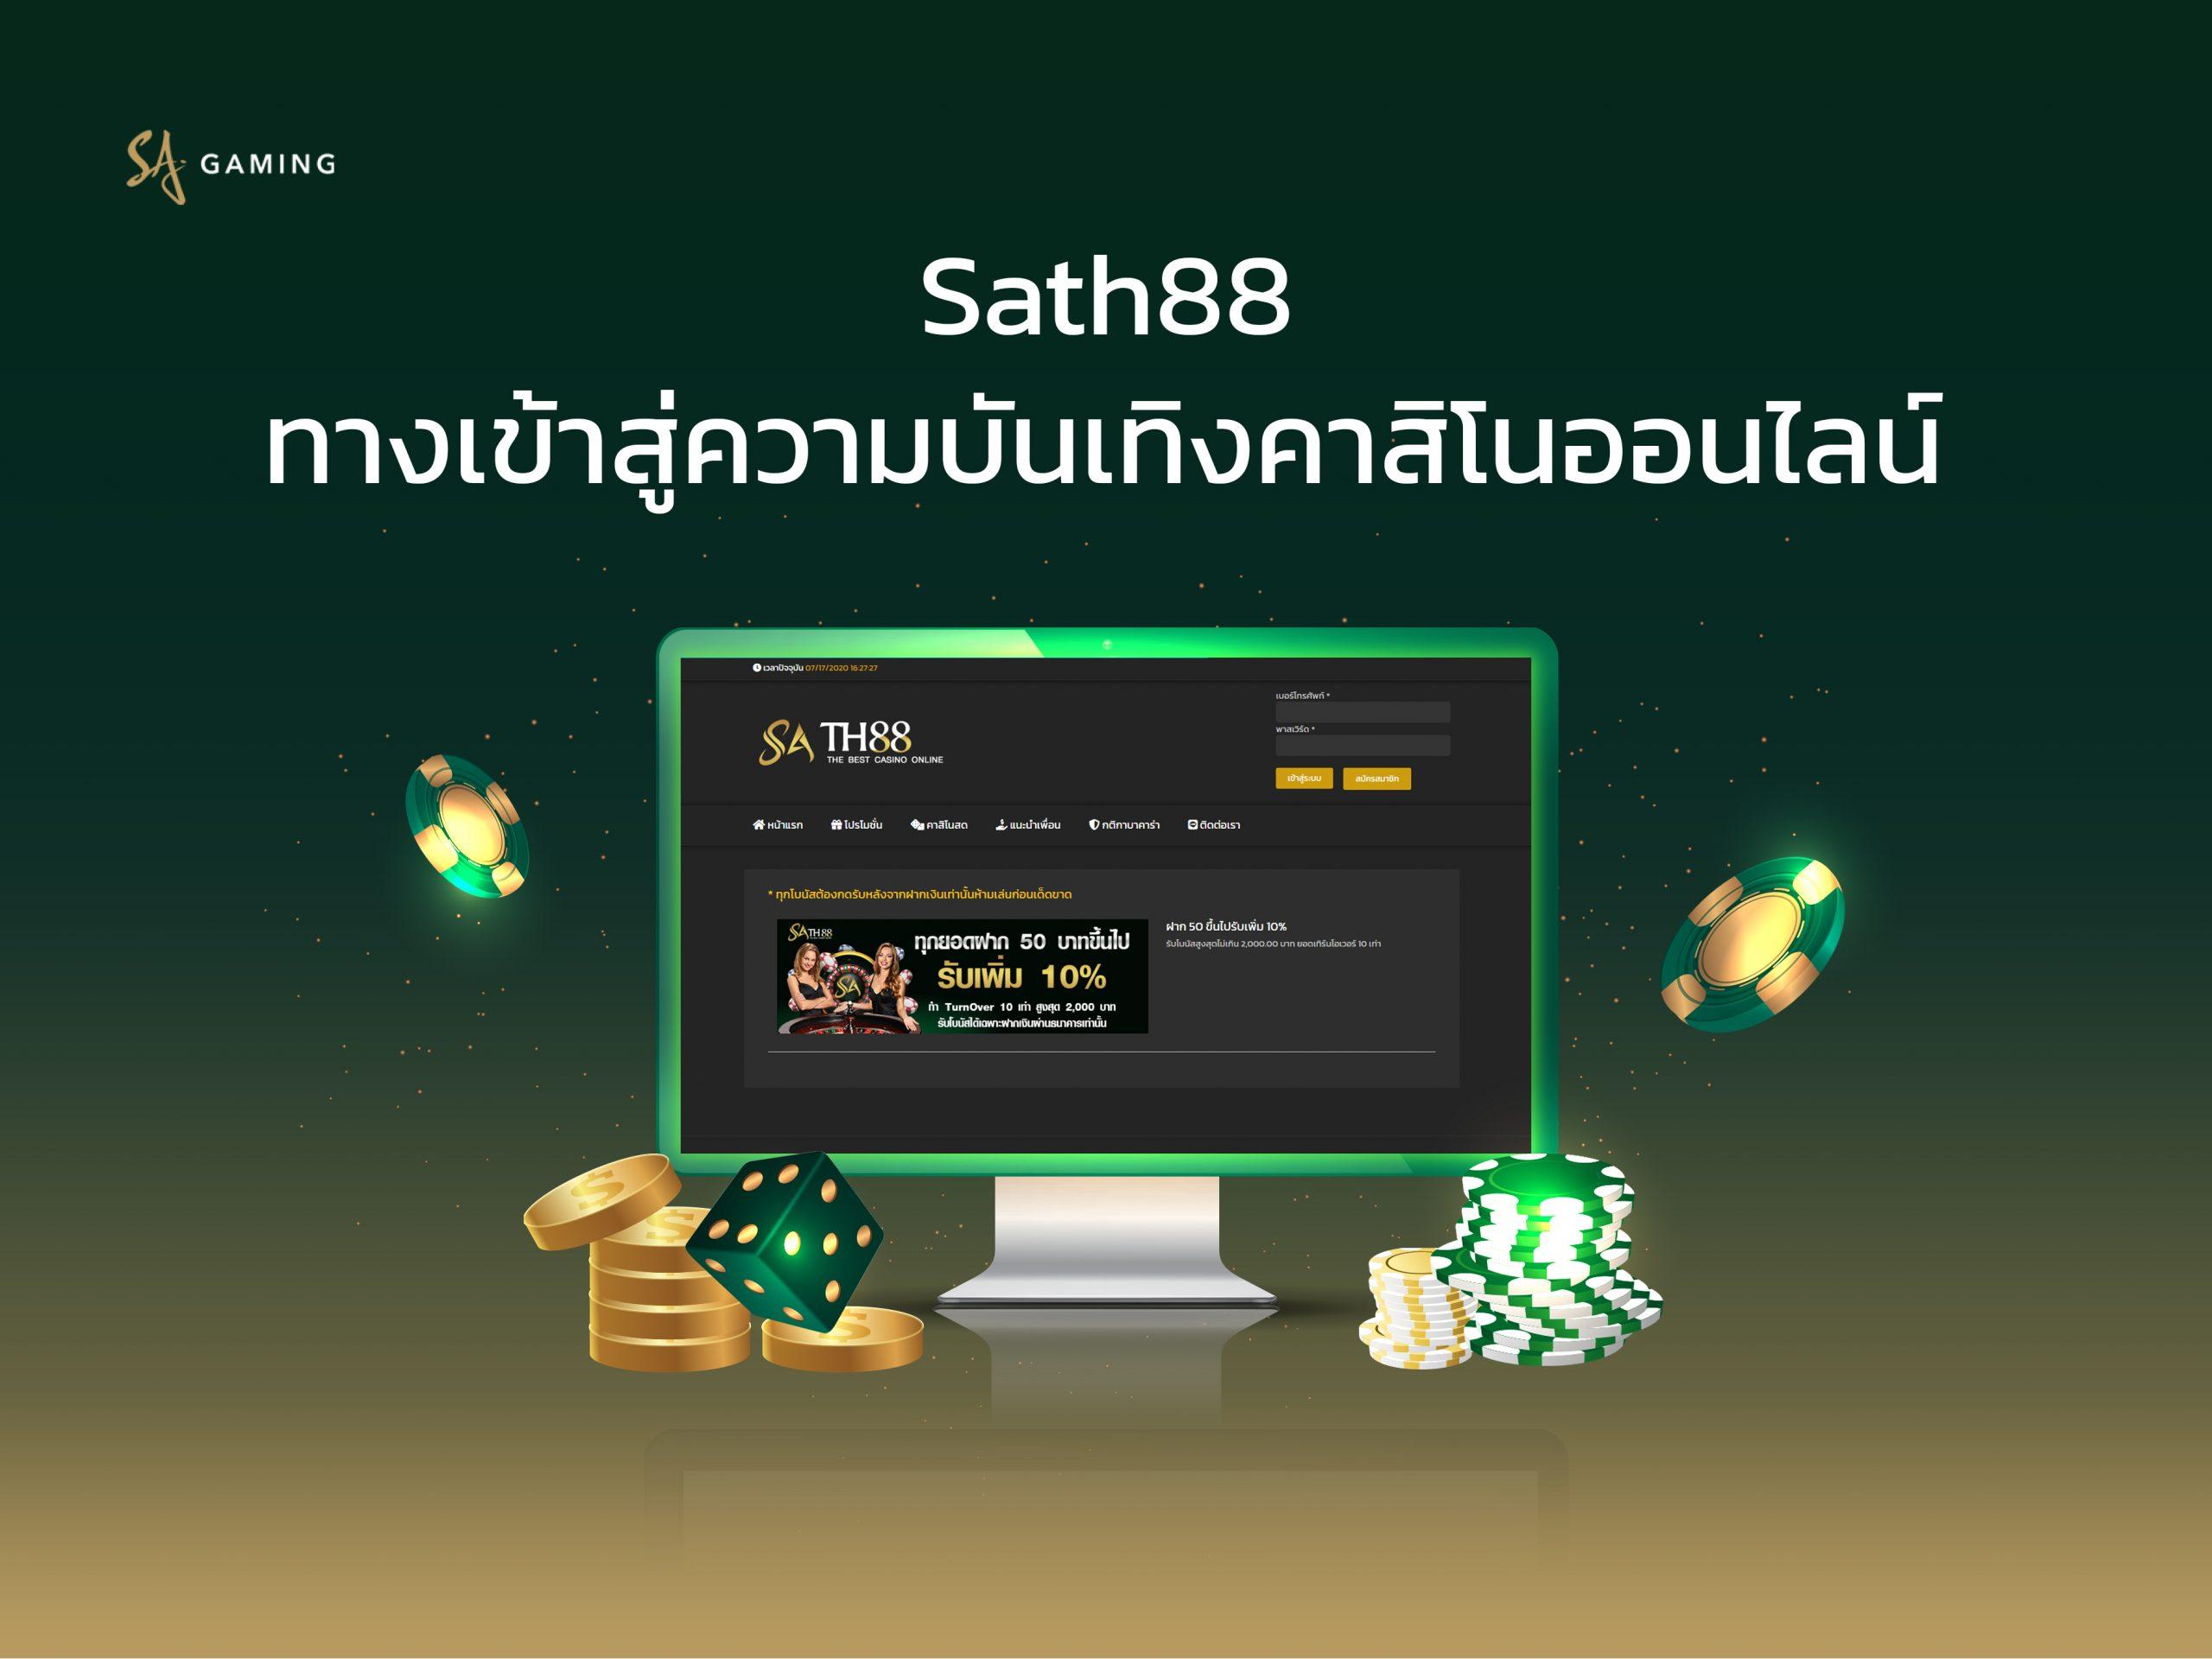 SATH88 ทางเข้าเล่น